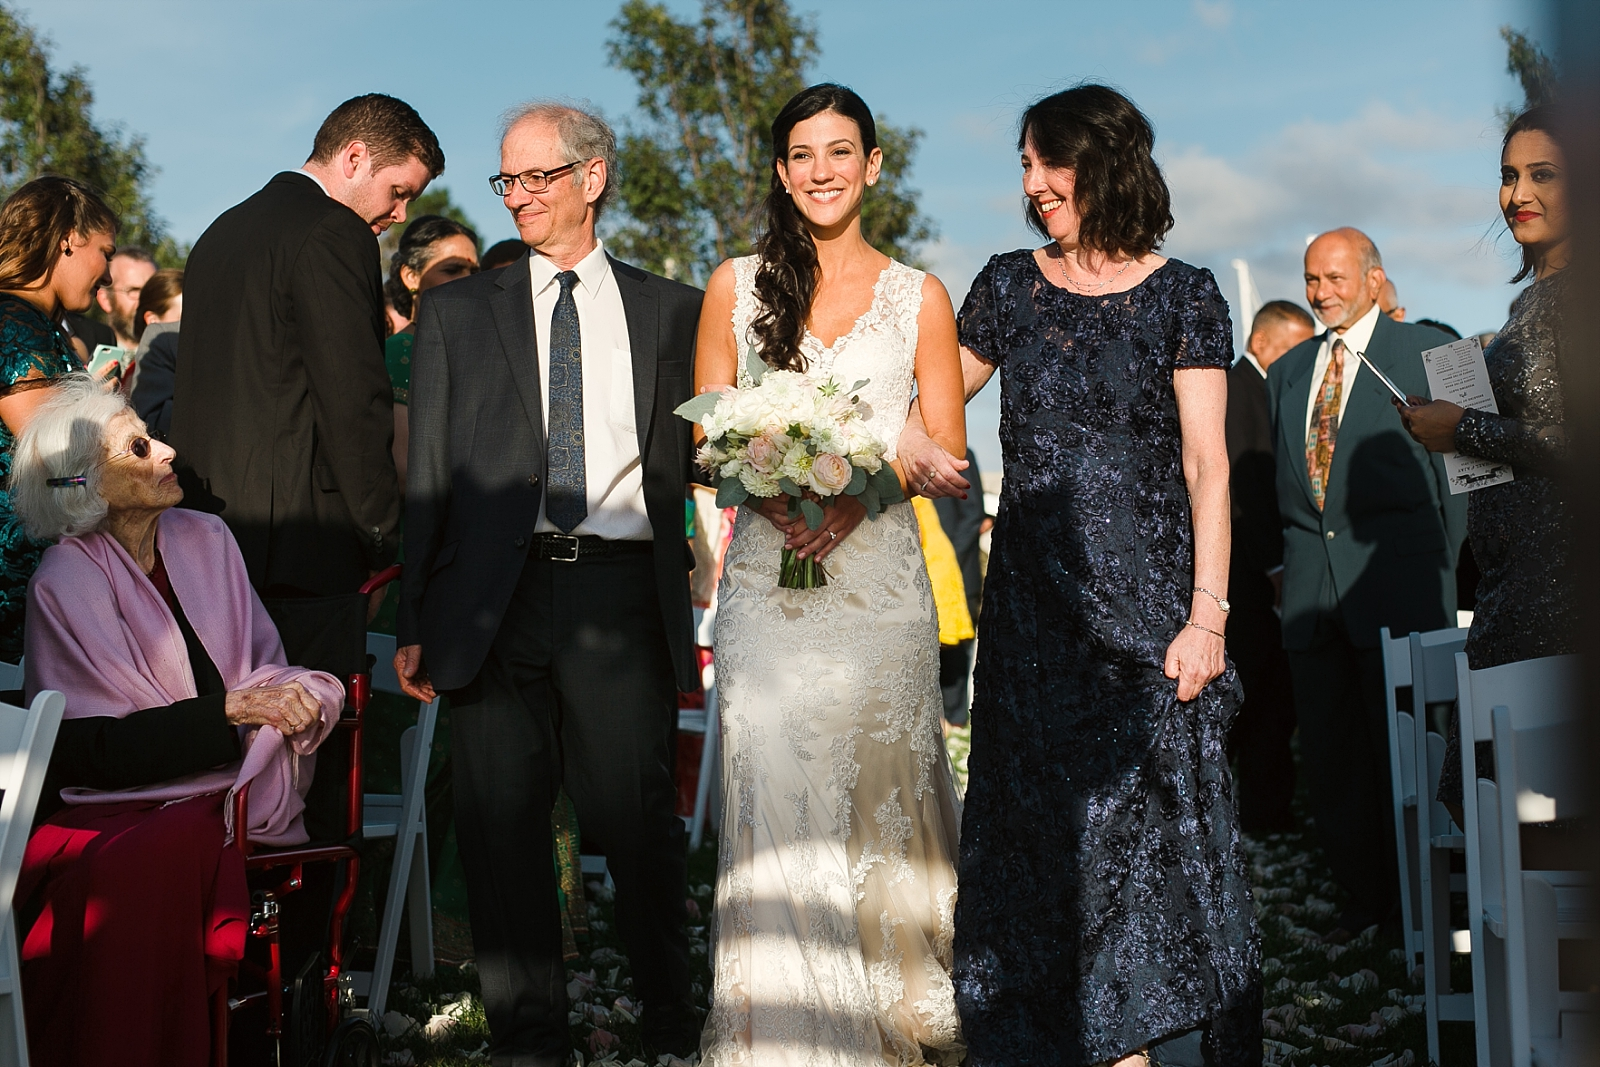 Newport_Wedding_Photographer_RaAj_Gallery_52.jpg